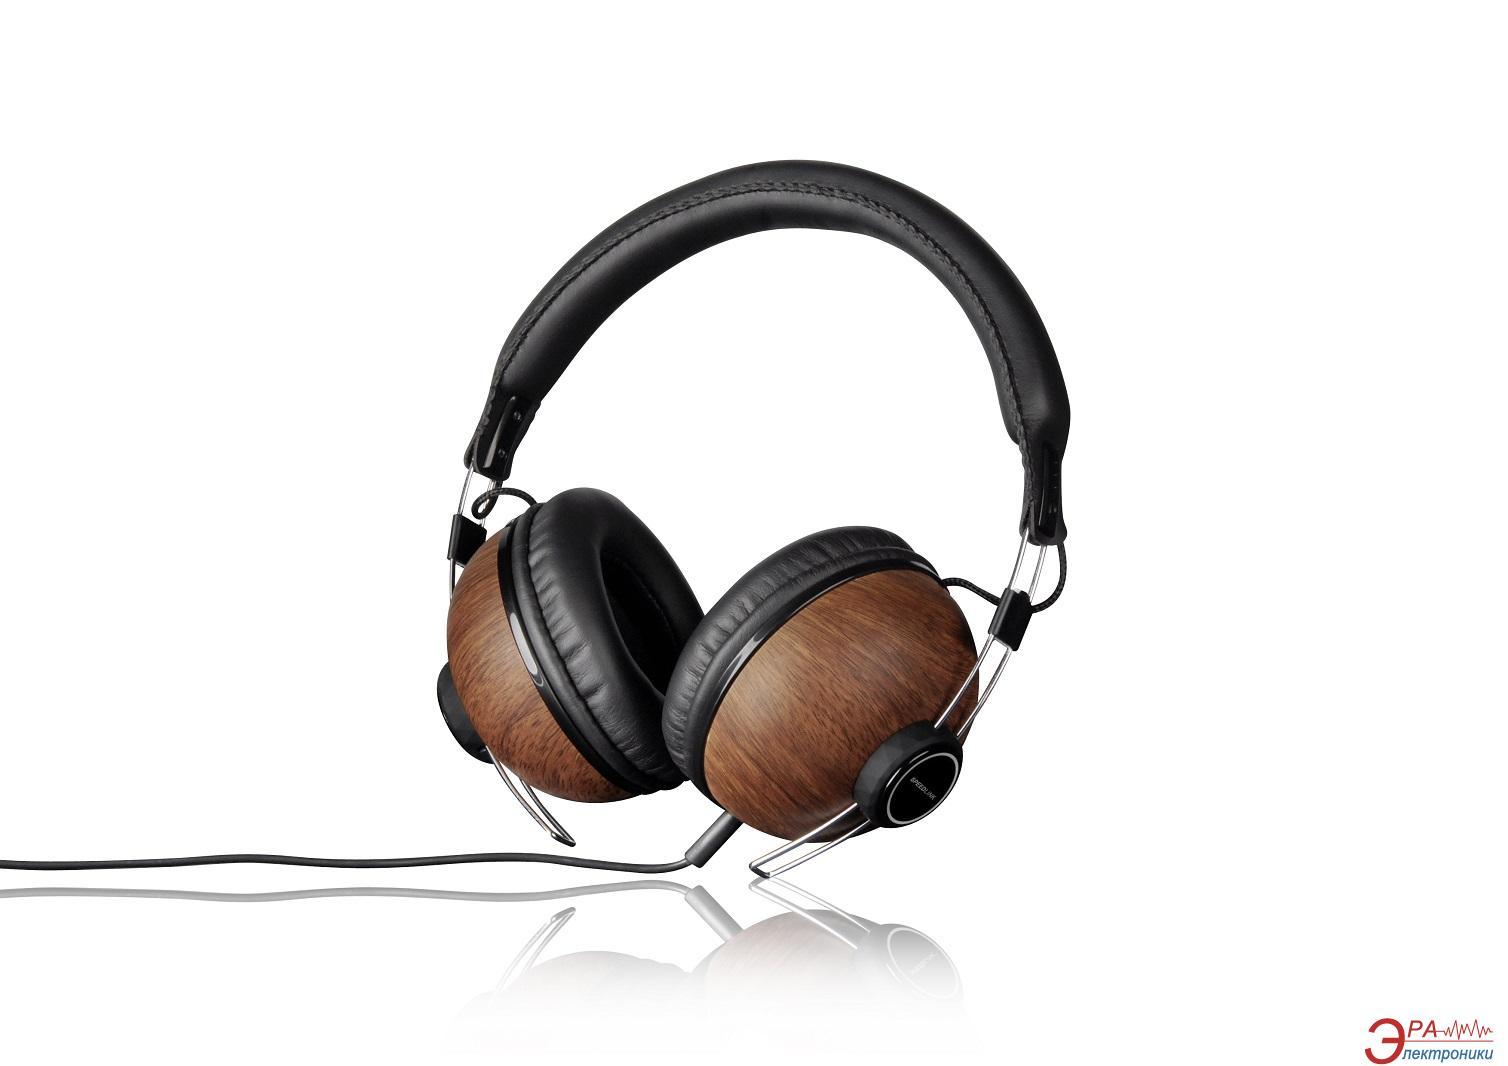 Гарнитура Speed Link BAZZ Stereo Headset wood (SL-8750-WOOD)